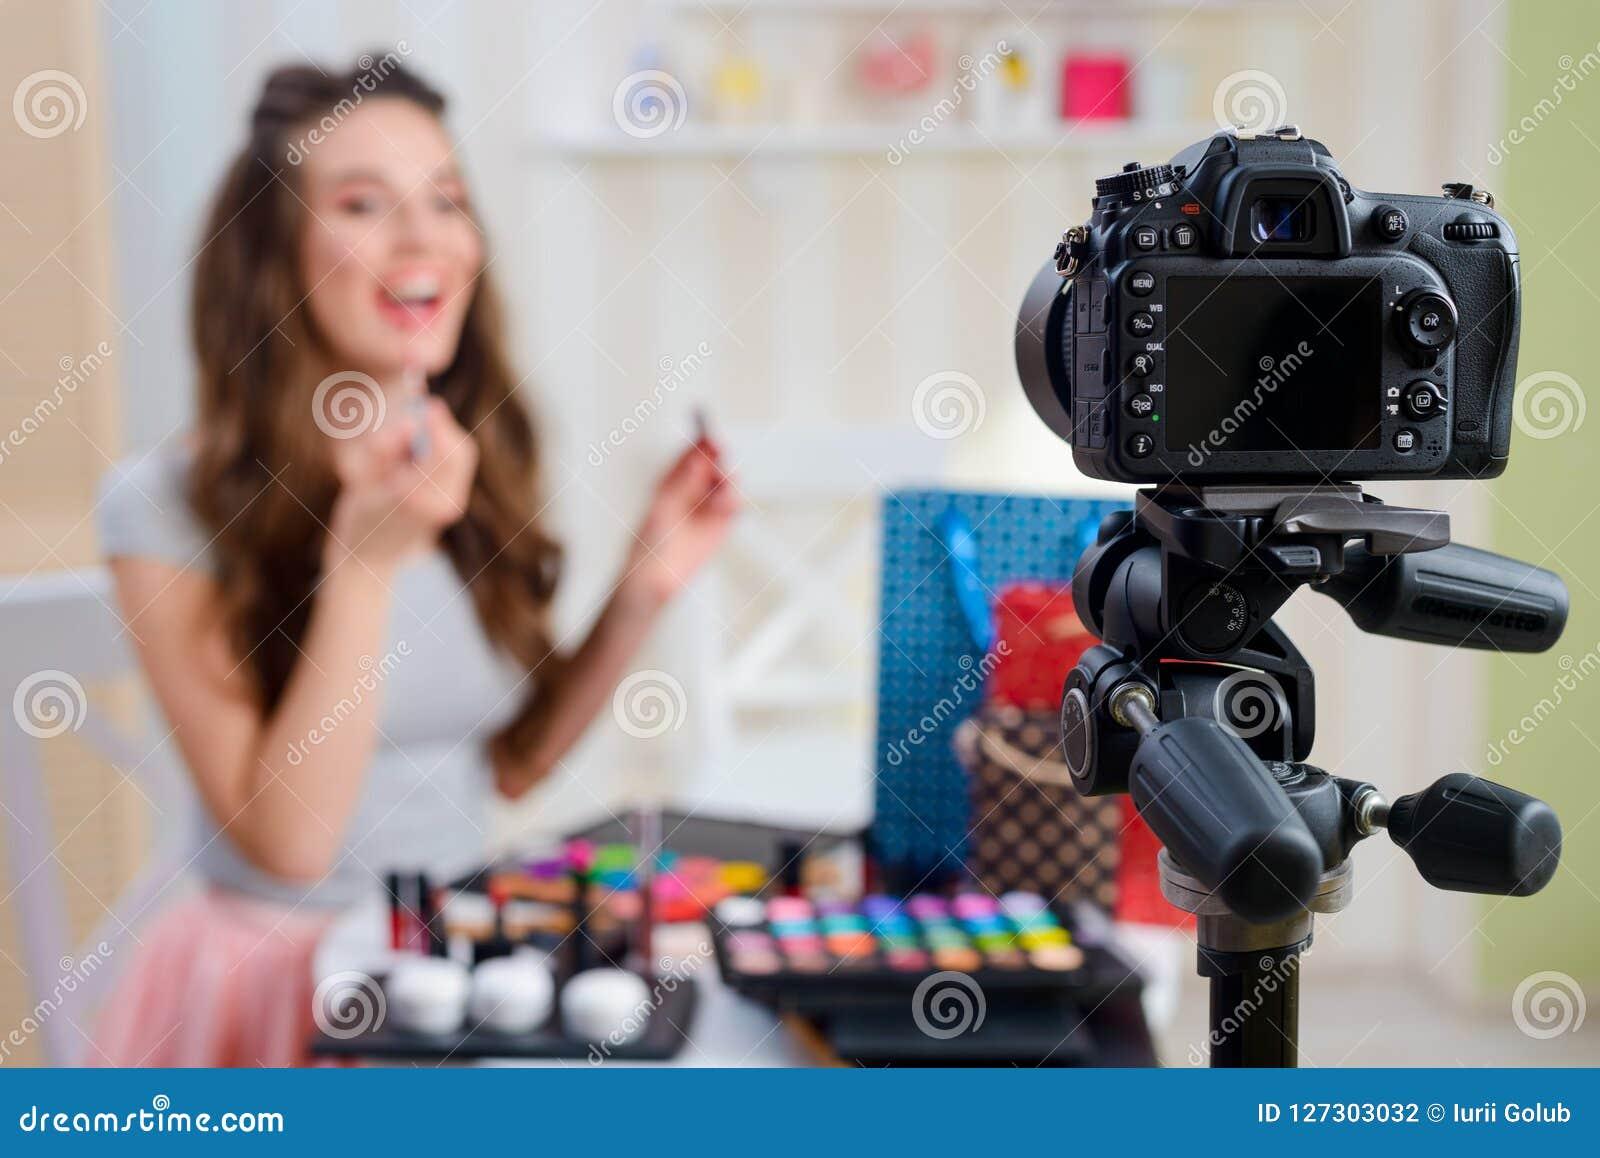 Beauty blogger applying lip gloss